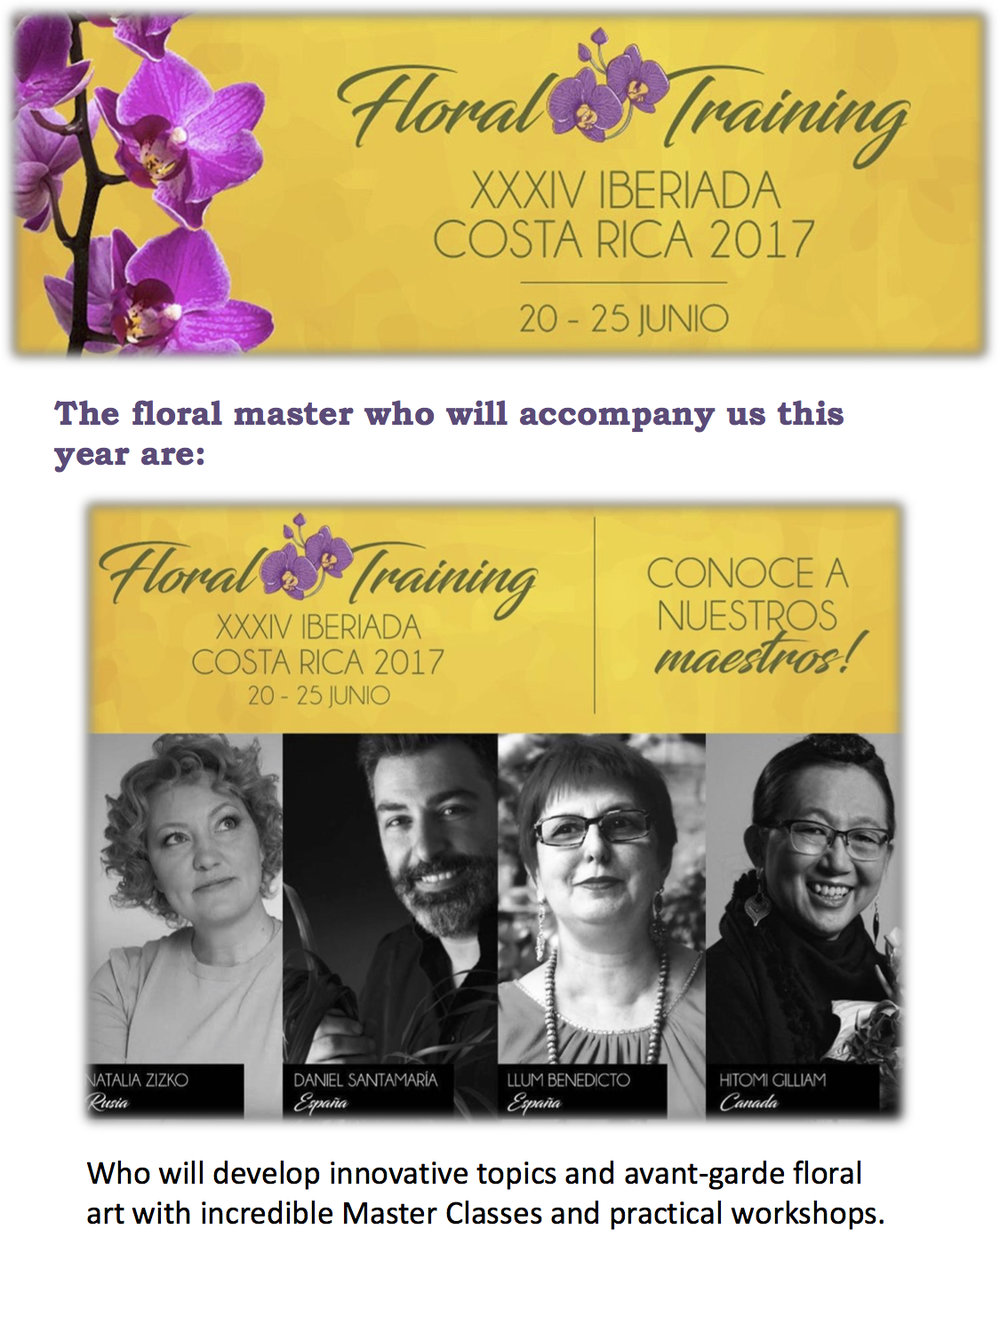 Floral Training - XXXIV Iberiada Costa Rica 2017 (English) 3.jpg